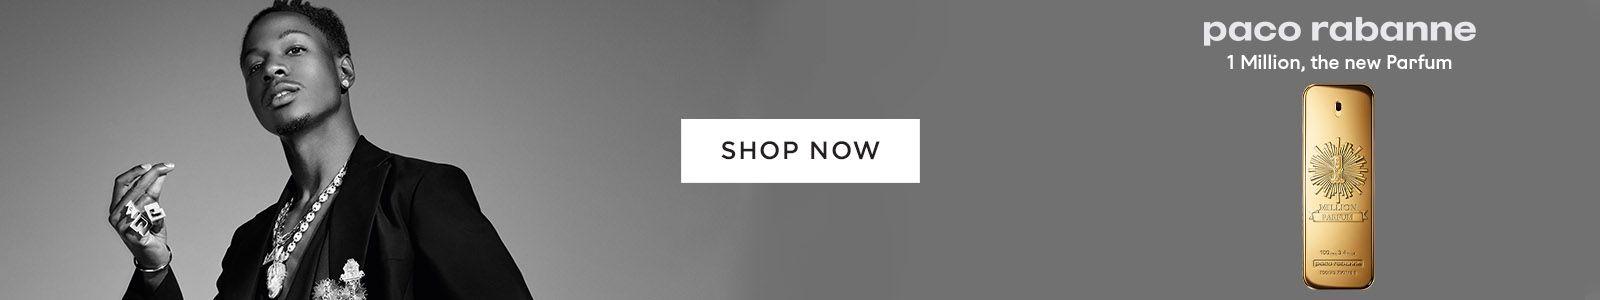 Shop Now, Paco Rabanne, 1 Million, the new Parfum